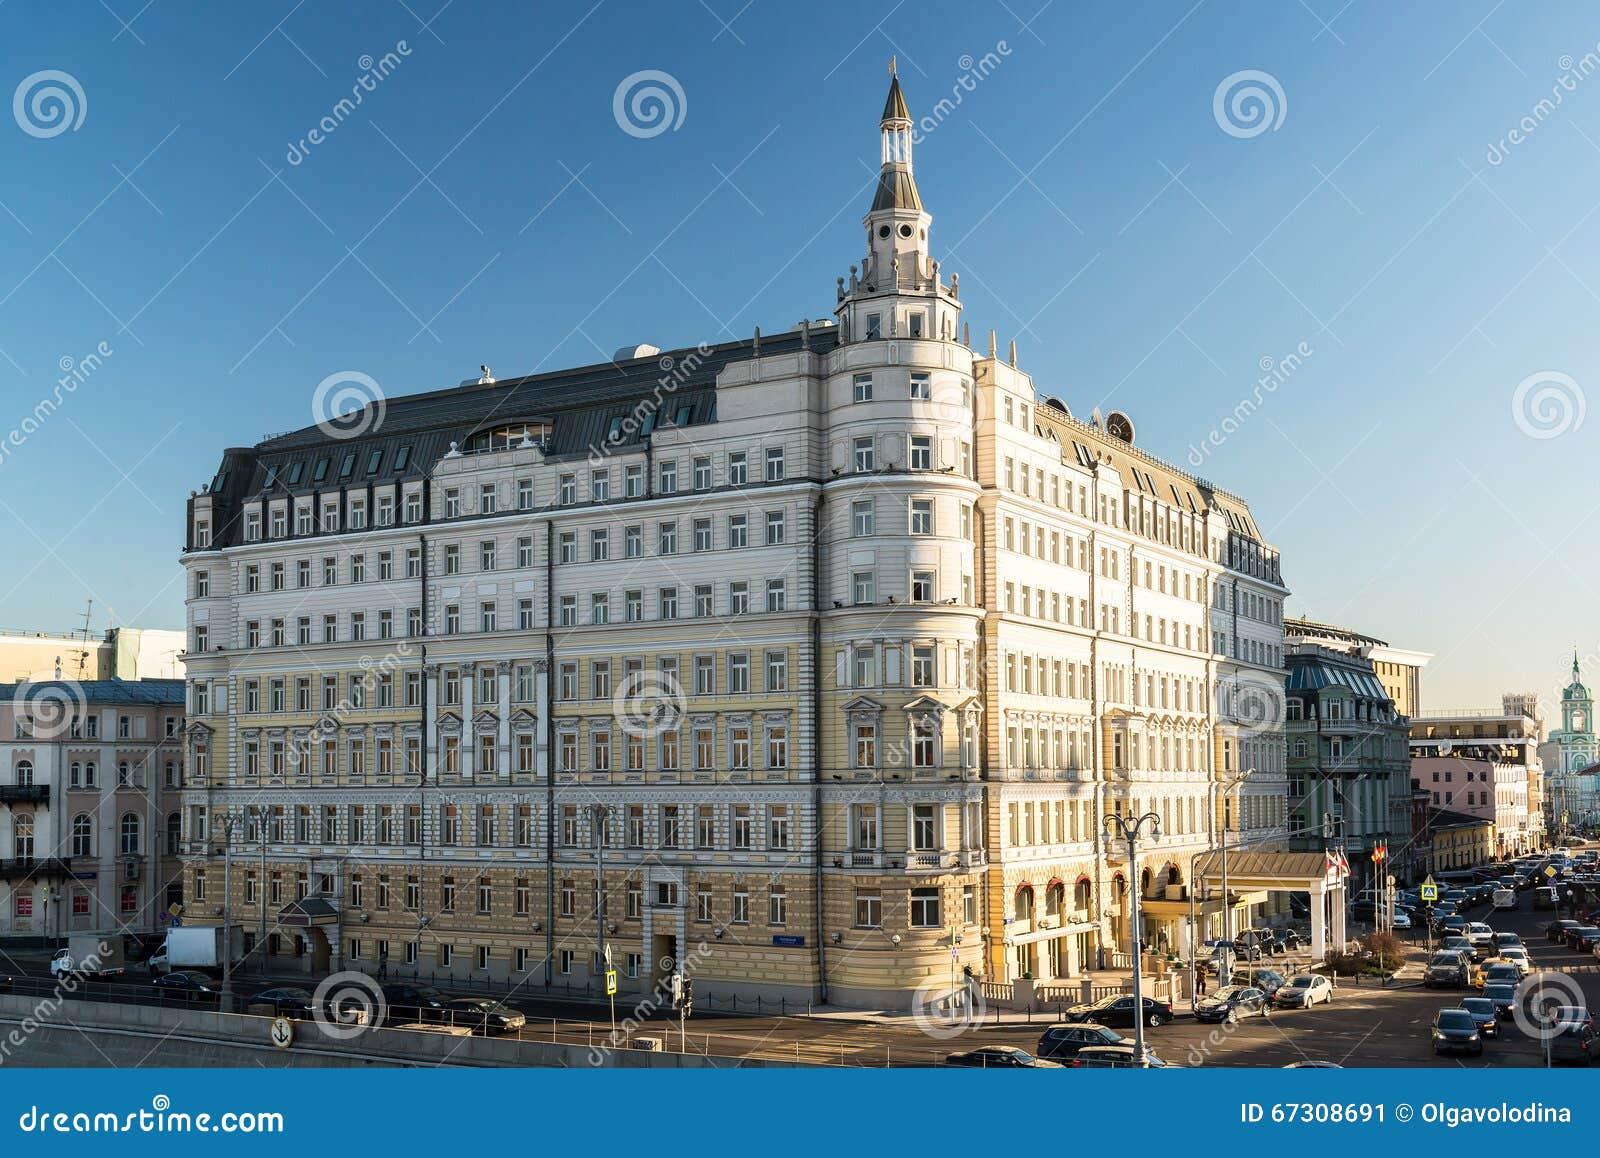 Moscú, Rusia - 18 de febrero 2016 Hotel Baltschug Kempinski y departamento territorial principal de Moscú de banco central de FED